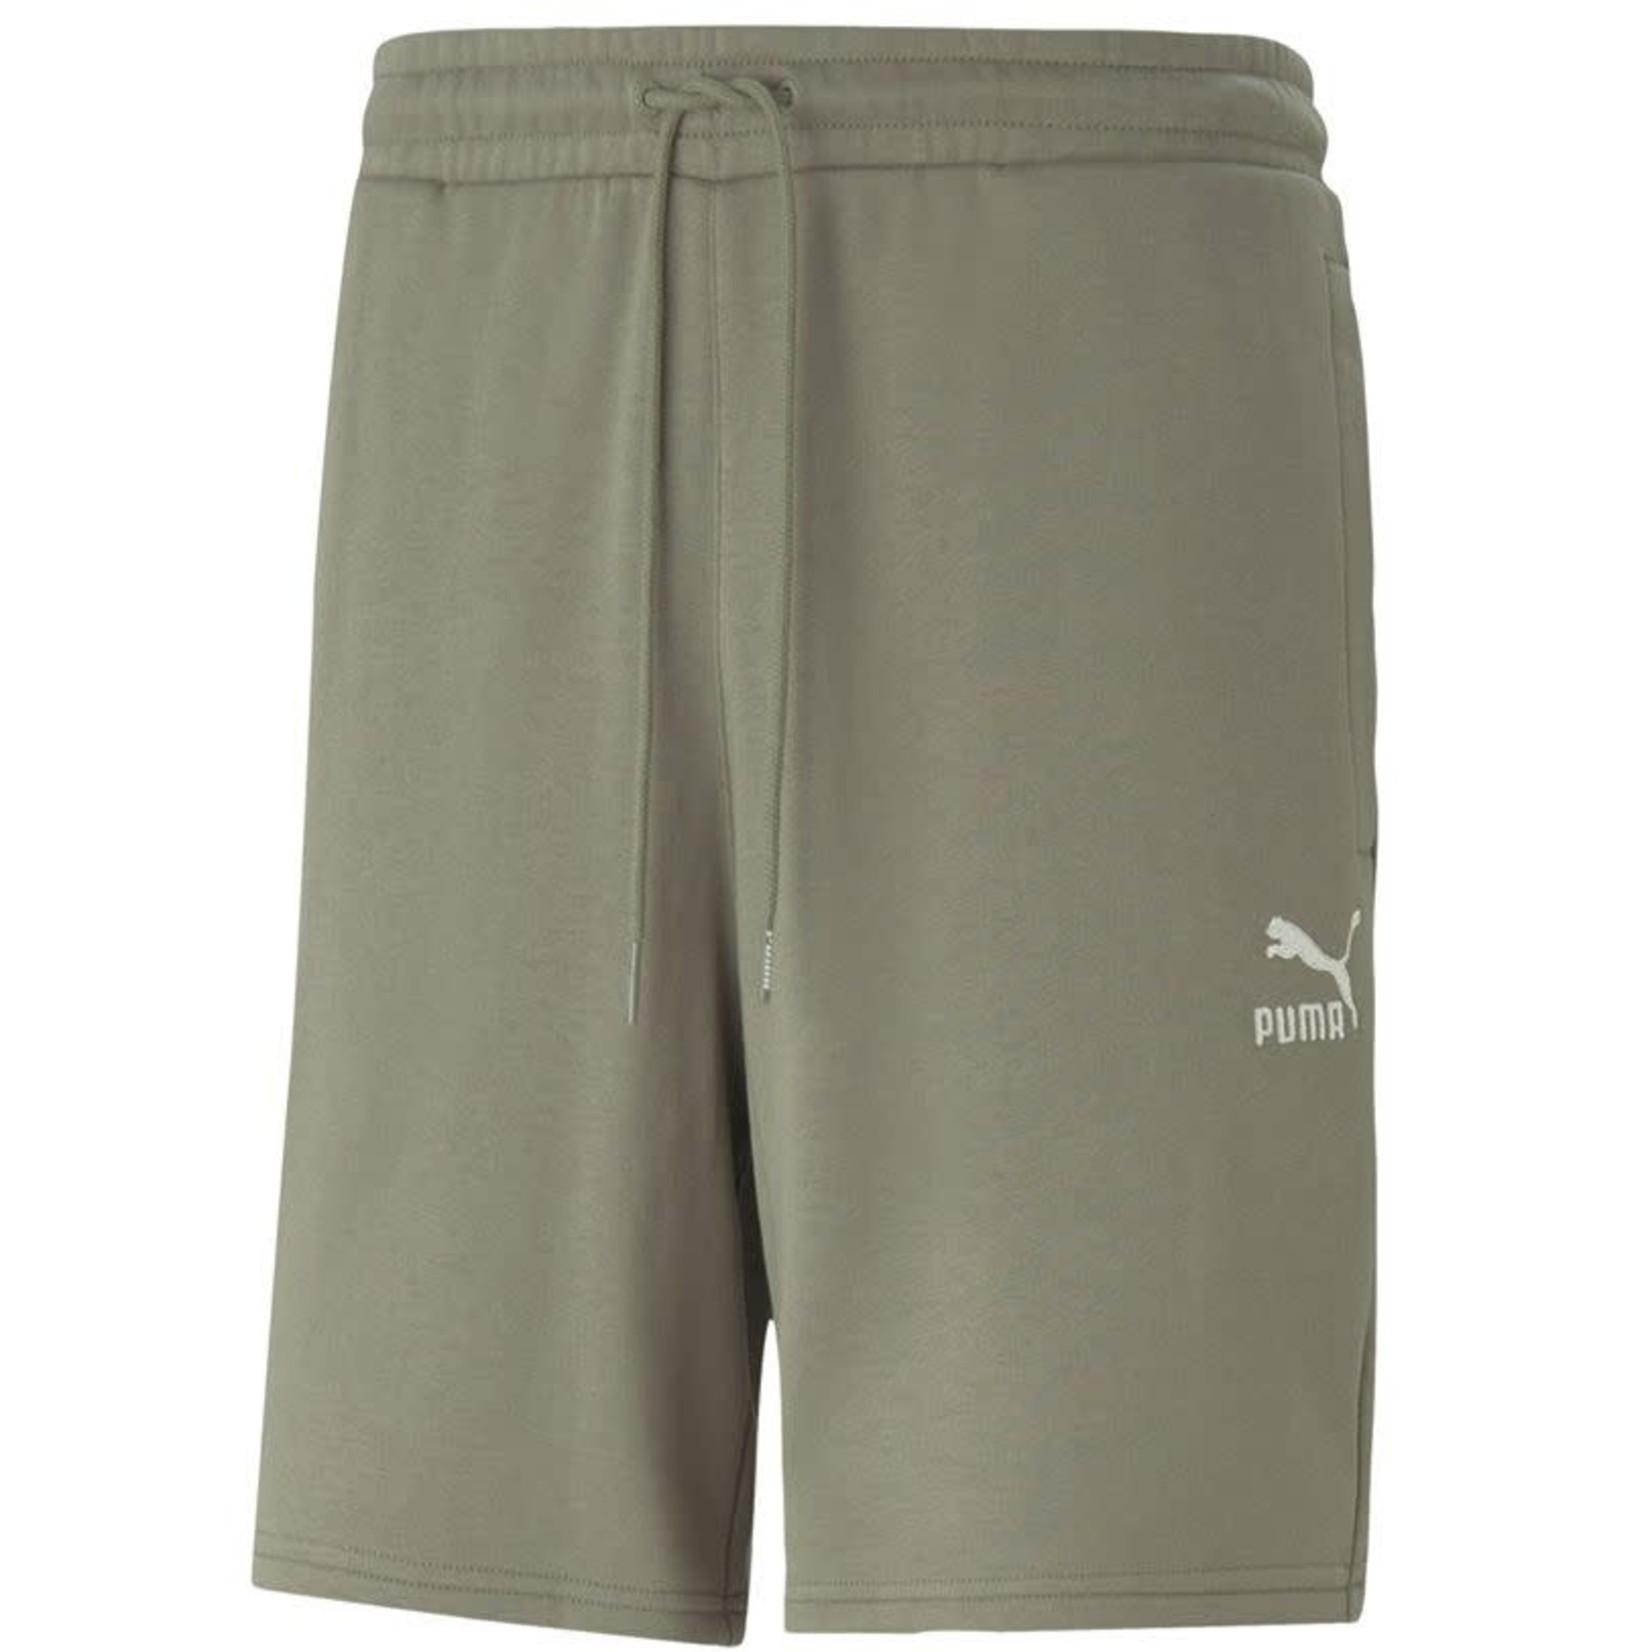 PUMA Puma : Classics Cargo Pockets Shorts